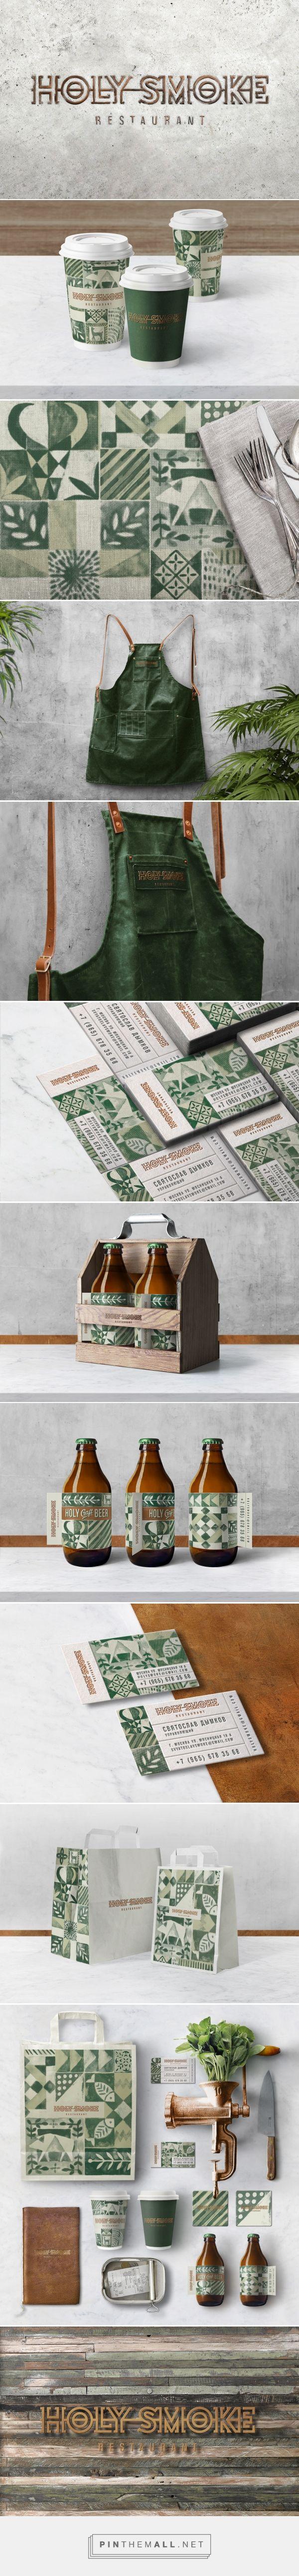 HOLY SMOKE Restaurant on Behance - created via https://pinthemall.net